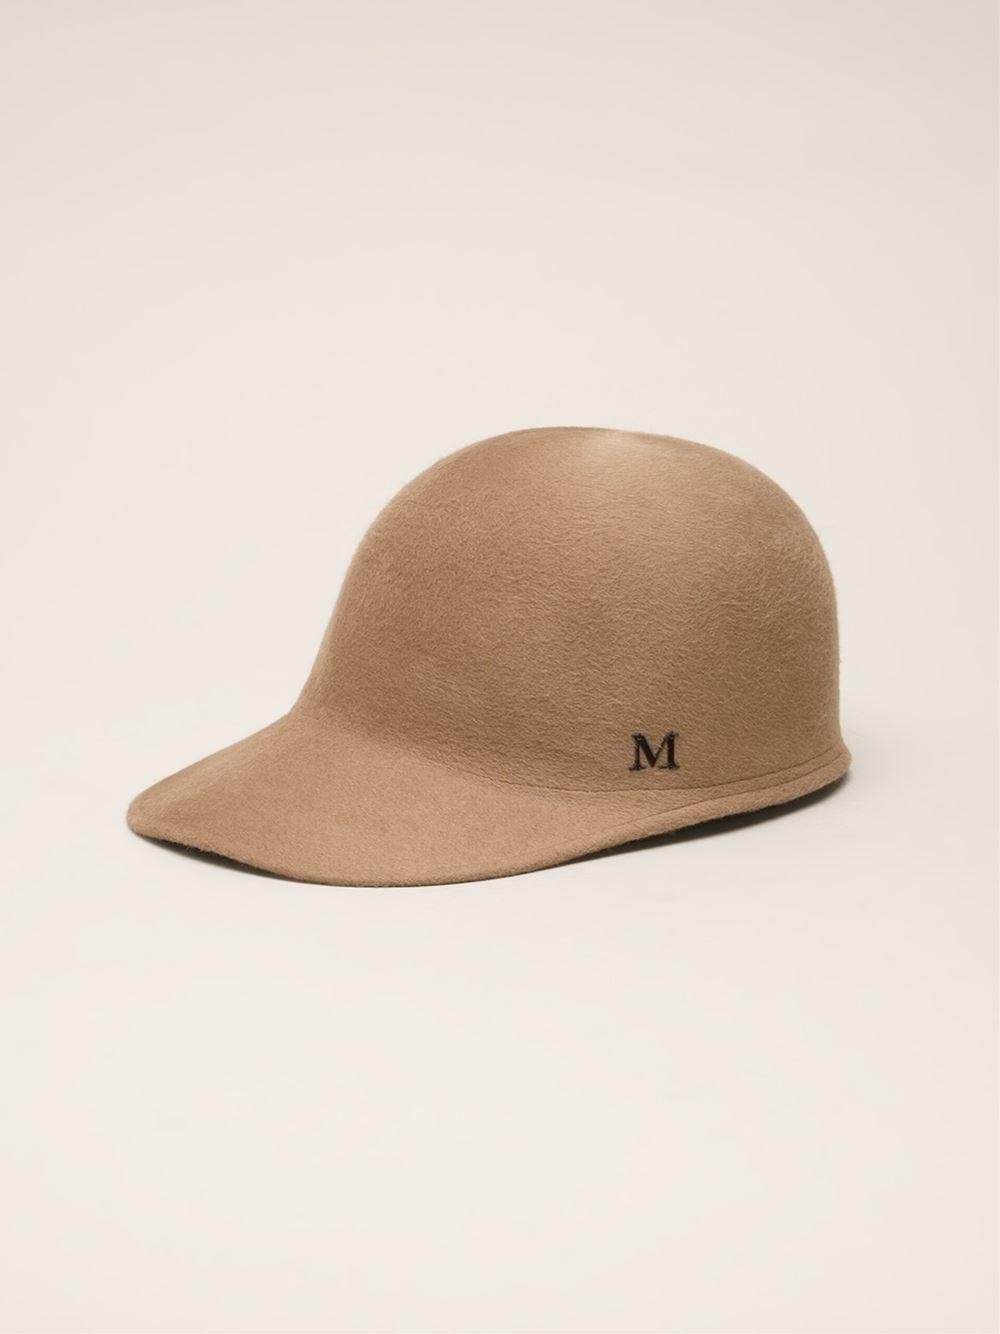 Maison michel 39 josh 39 hat in brown lyst for Maison michel